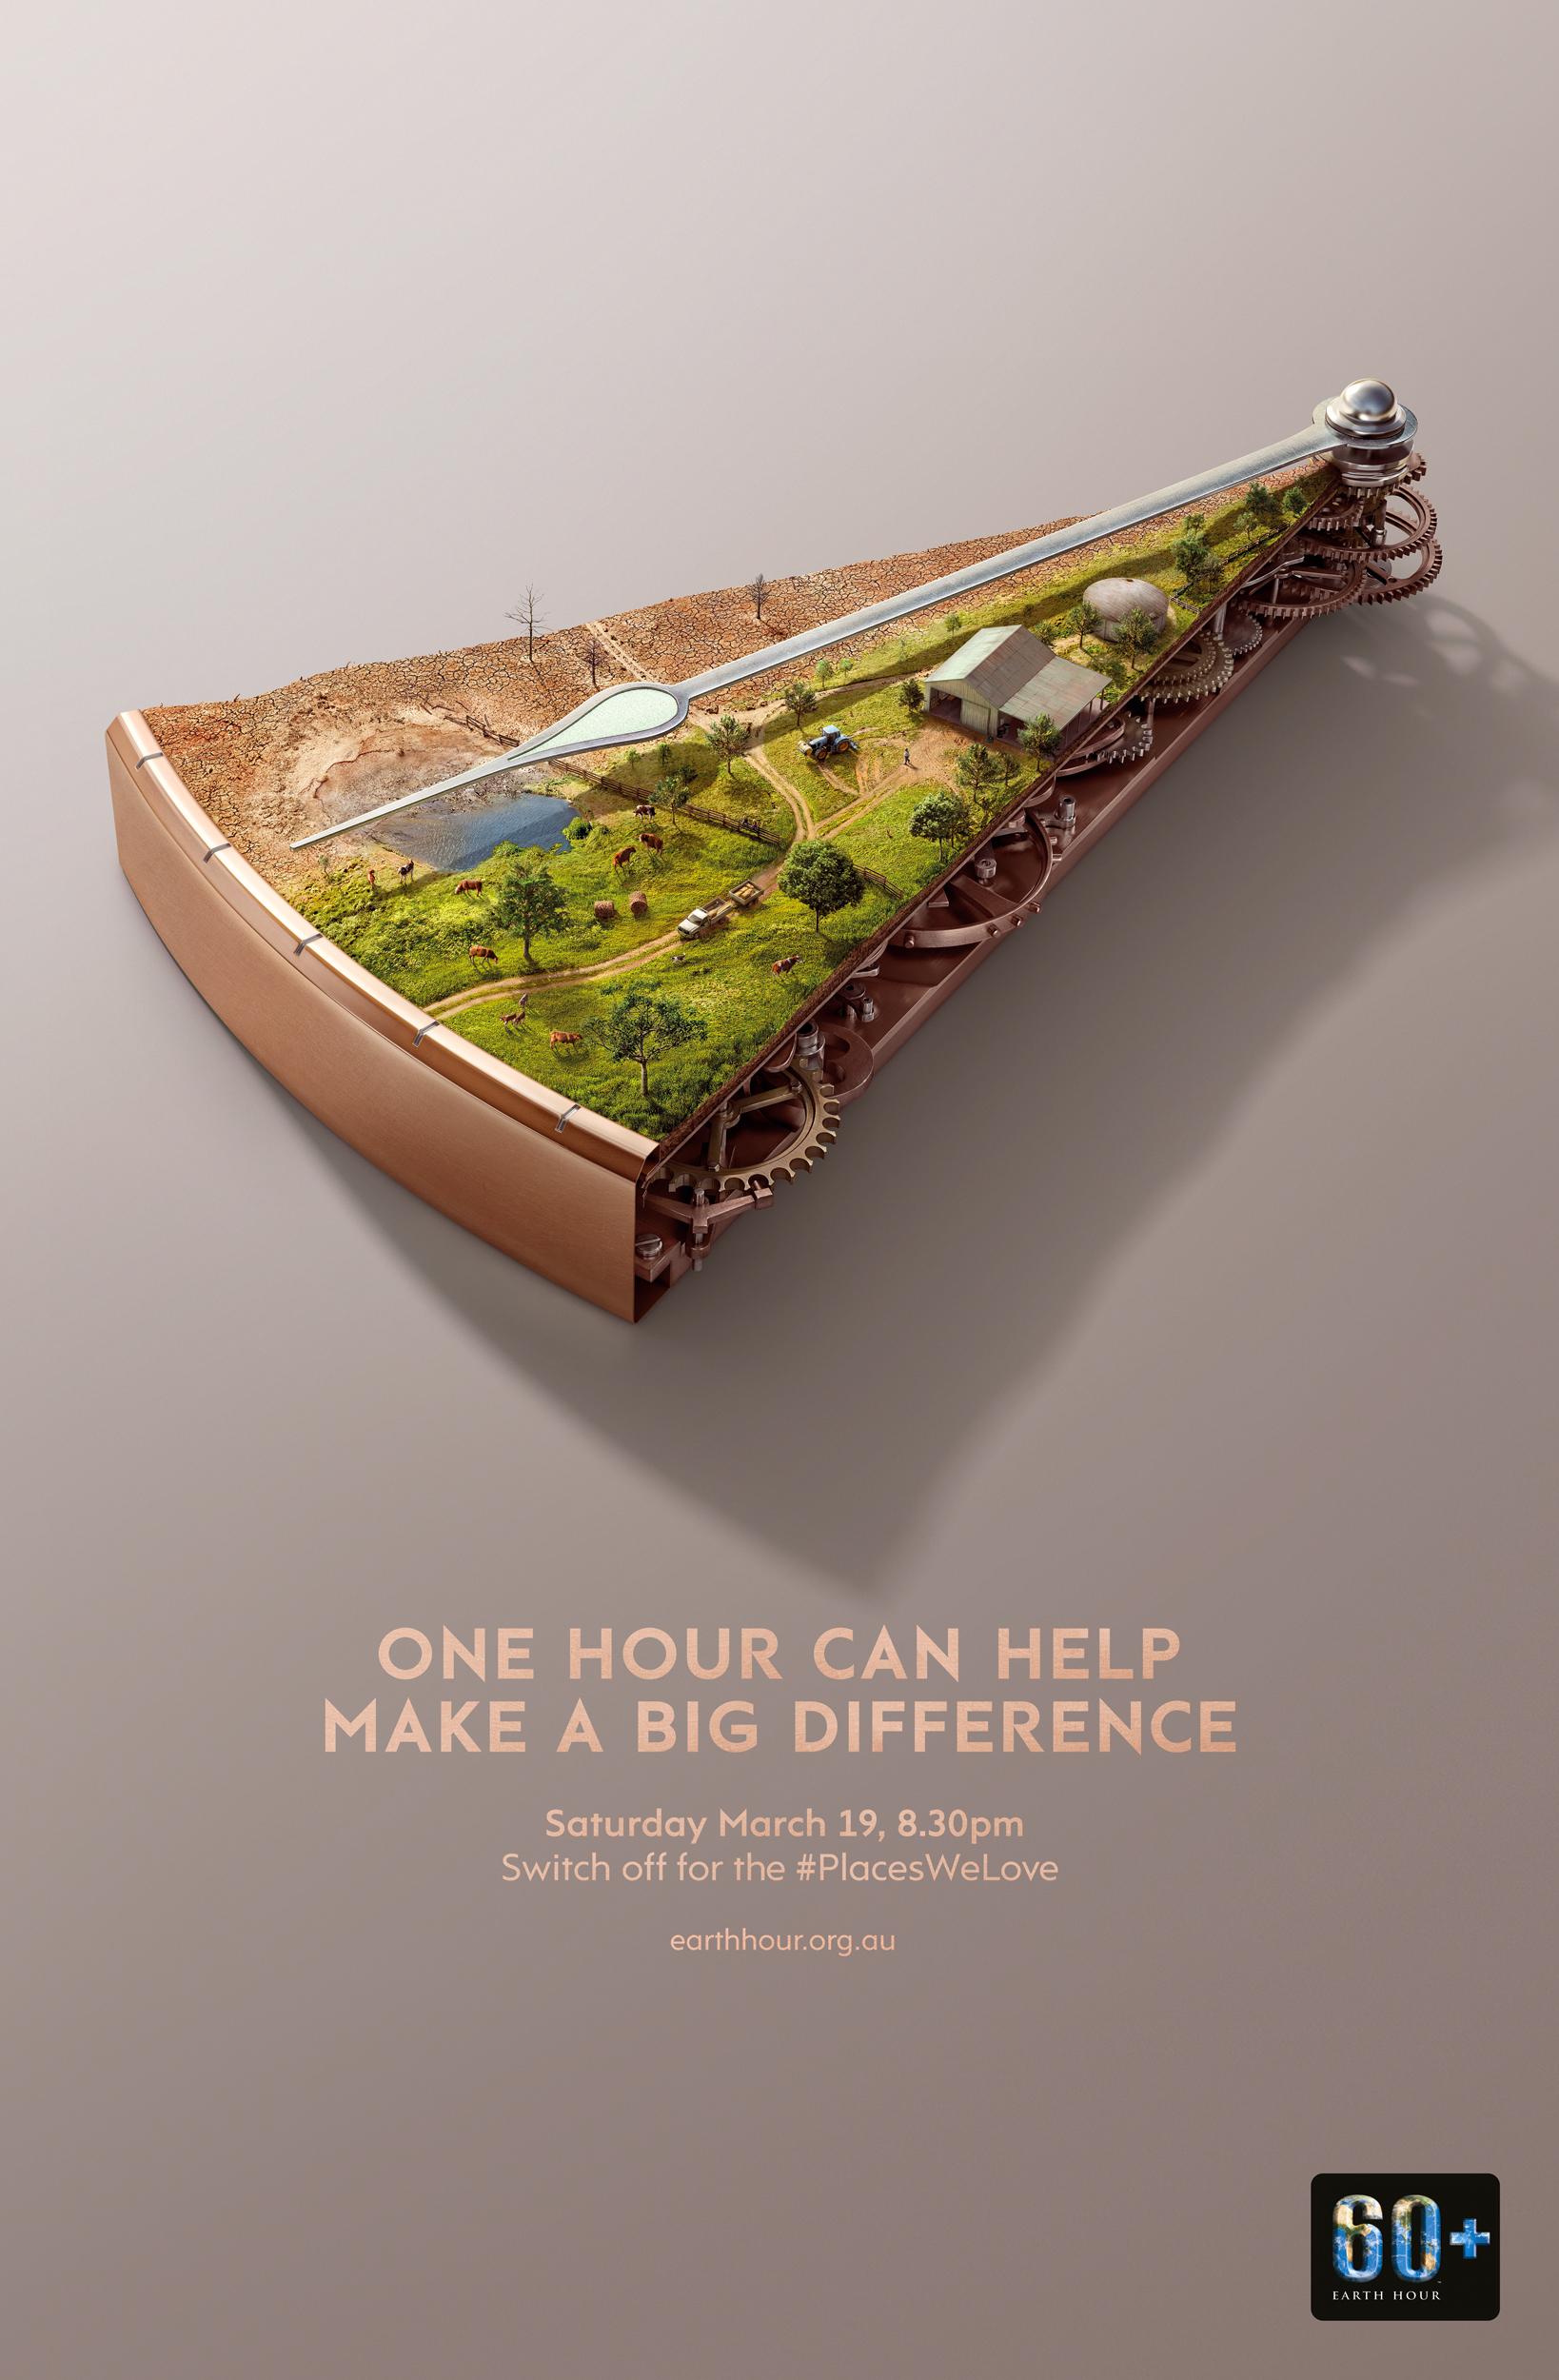 C_Earth_Hour_Drought_Srgb.jpg